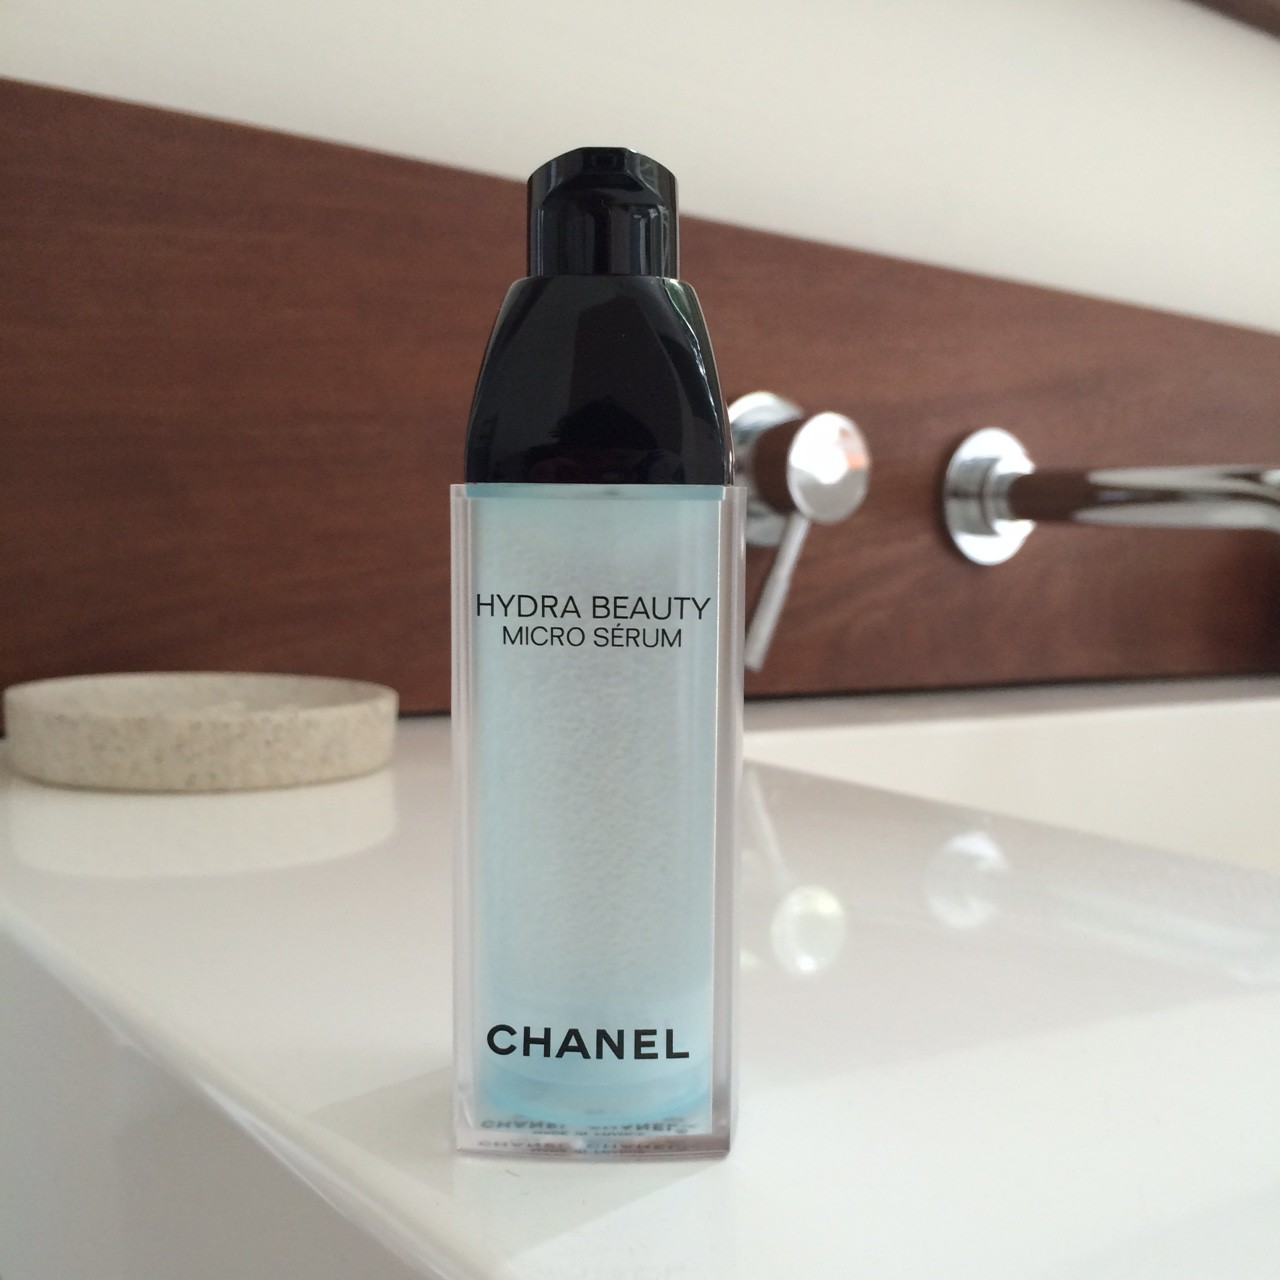 hydra beauty micro serum chanel